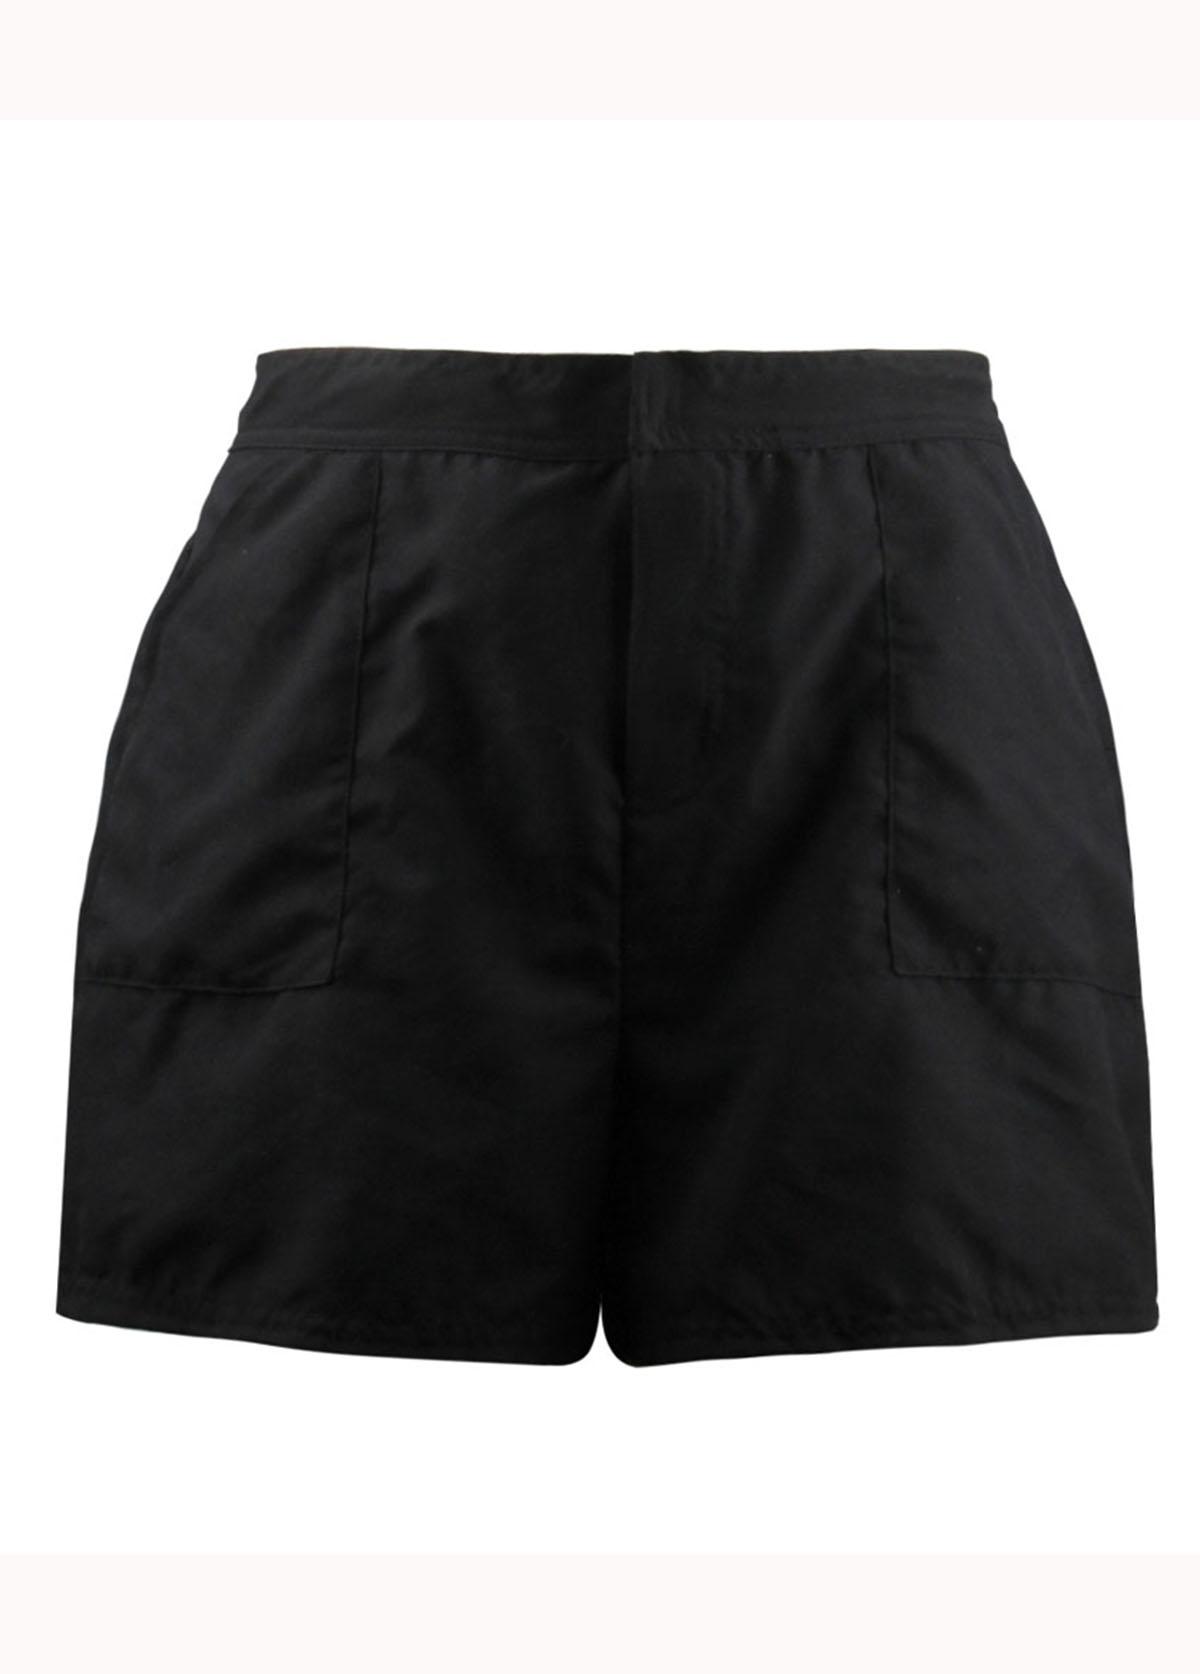 Elastic Waist Black Beach Shorts for Women